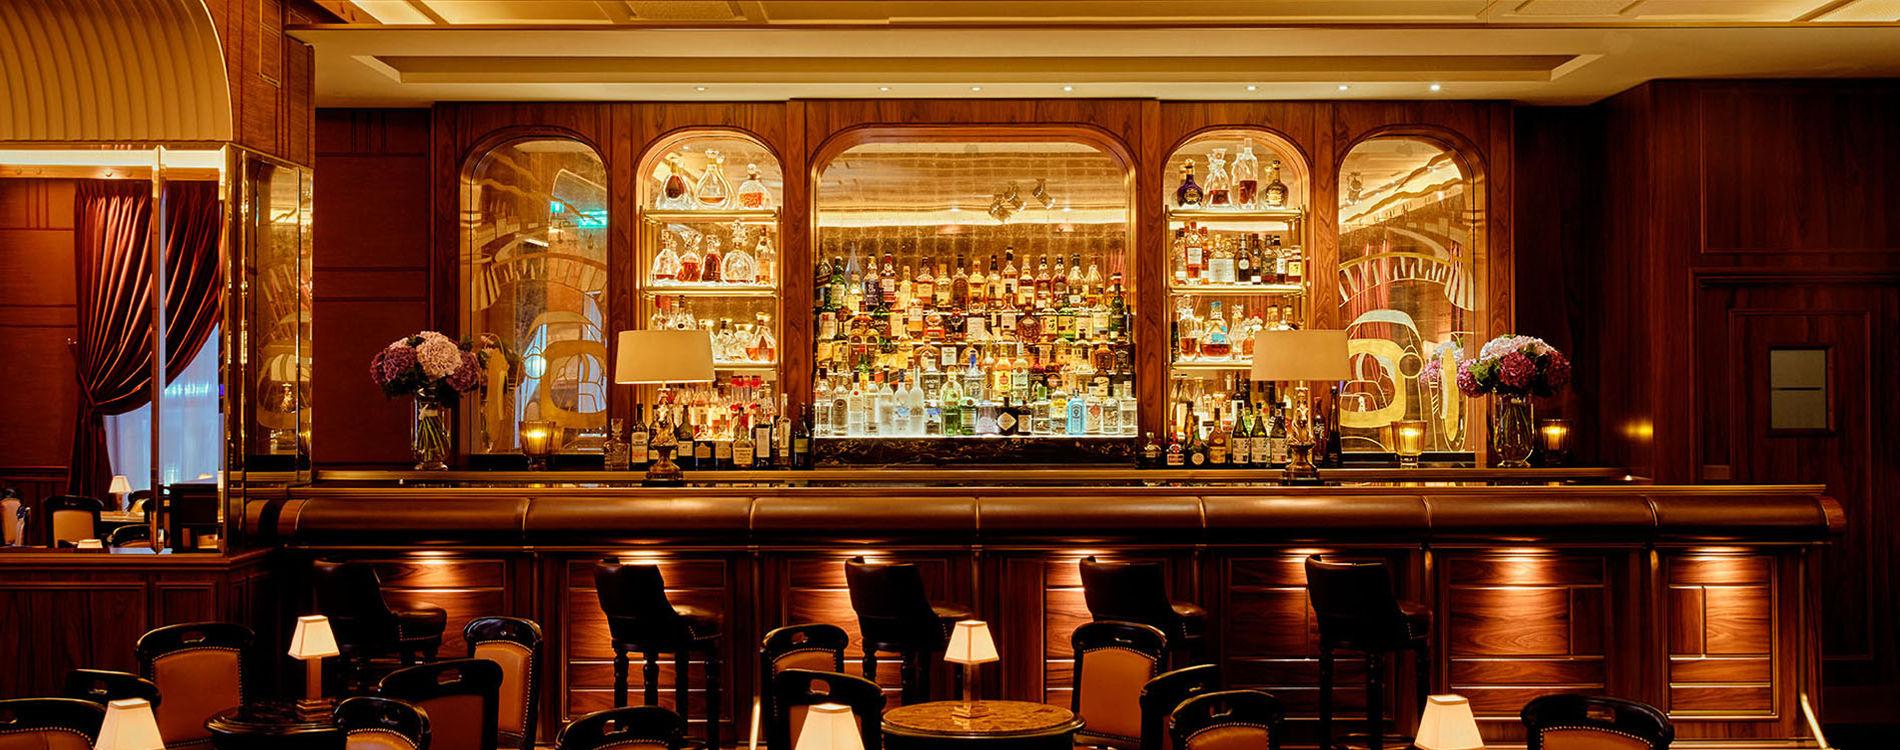 The Bar Américain Monaco | Monte-Carlo Société des Bains de Mer